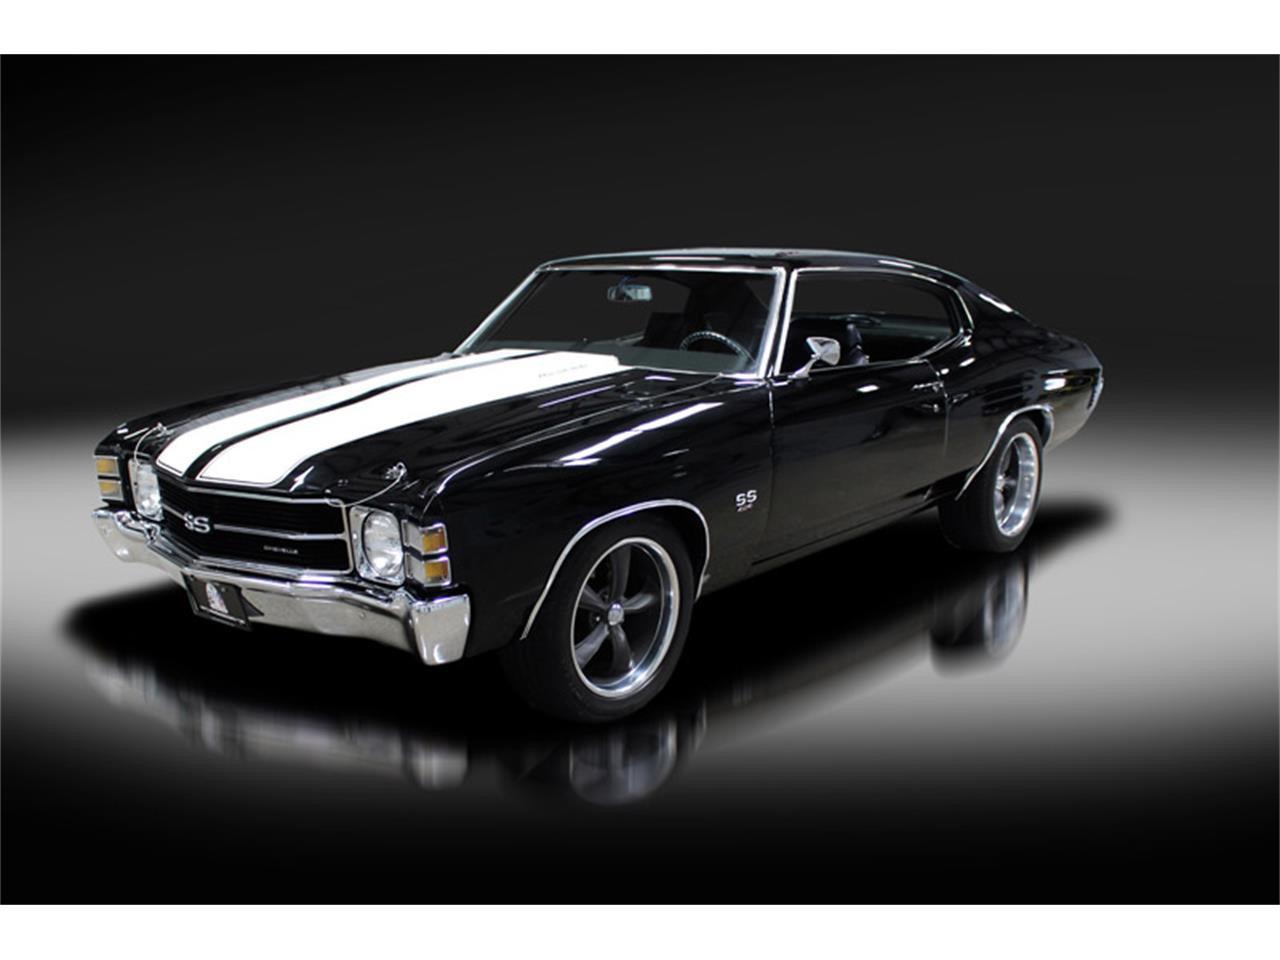 Cars Under 5000 >> 1971 Chevrolet Chevelle SS Custom for Sale | ClassicCars.com | CC-1010968